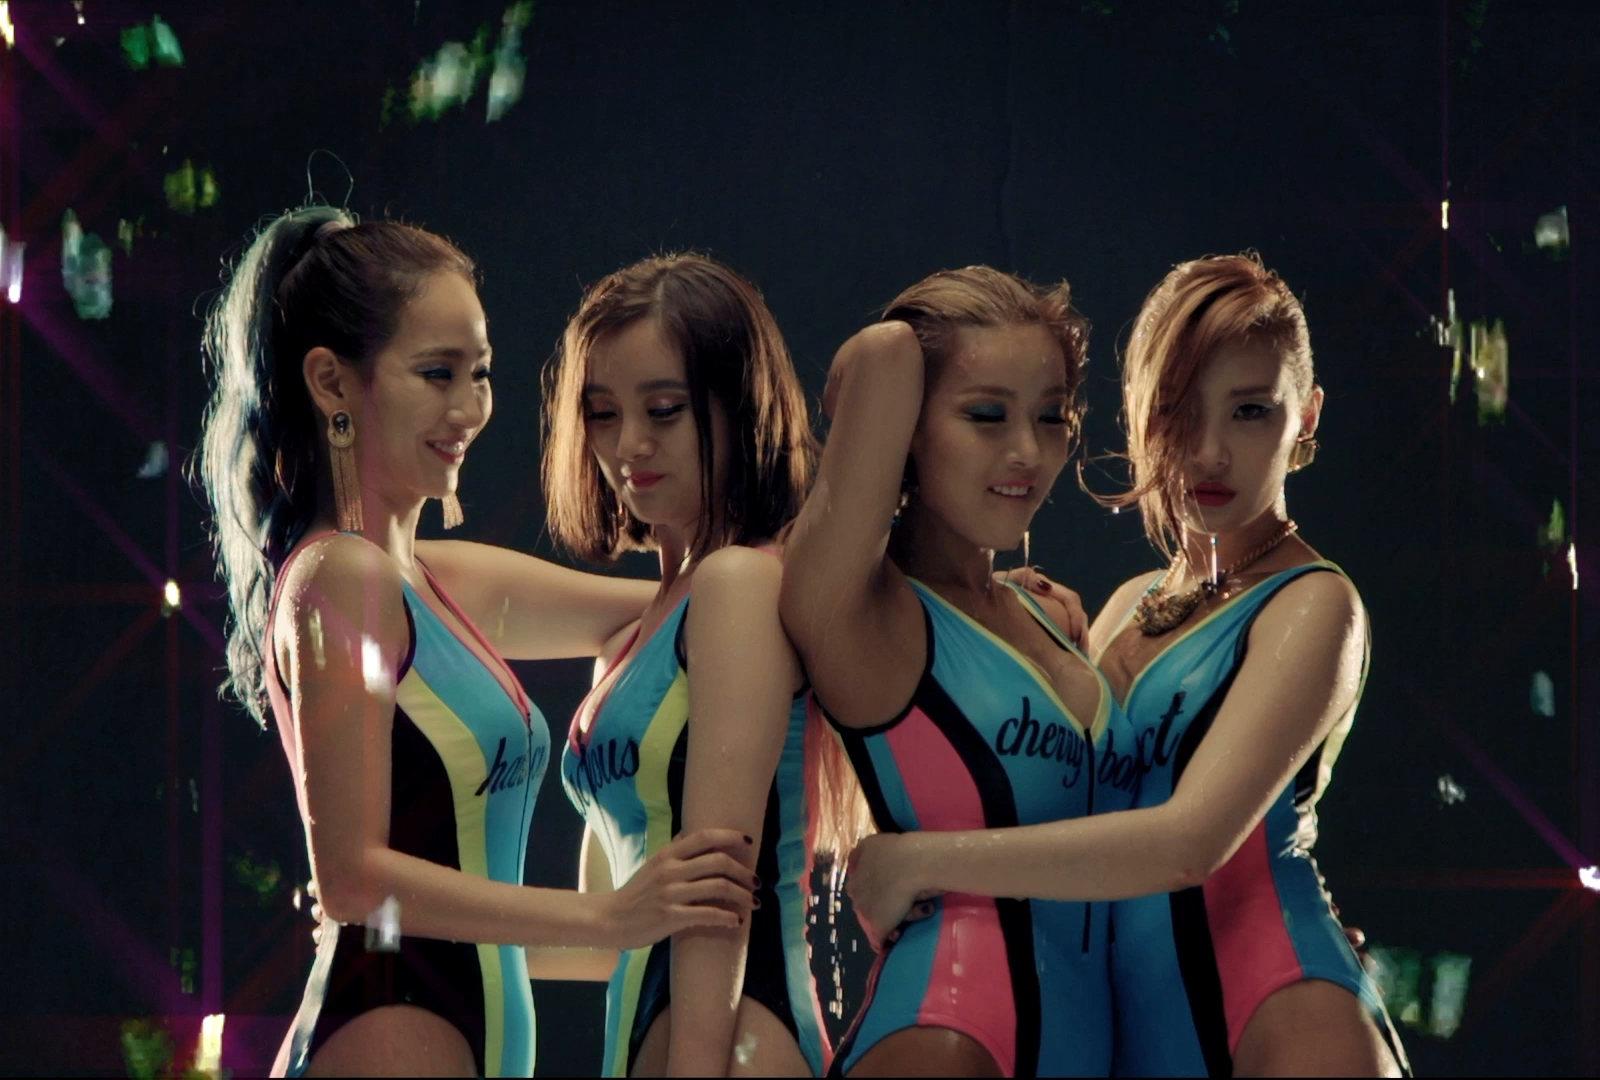 Wonder Girls I Feel You who's who